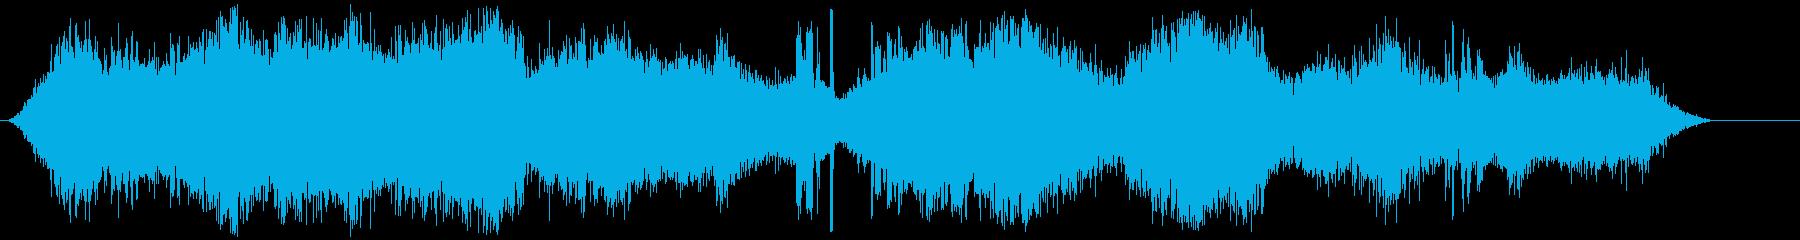 Guard 2を使用したトラフィックの再生済みの波形